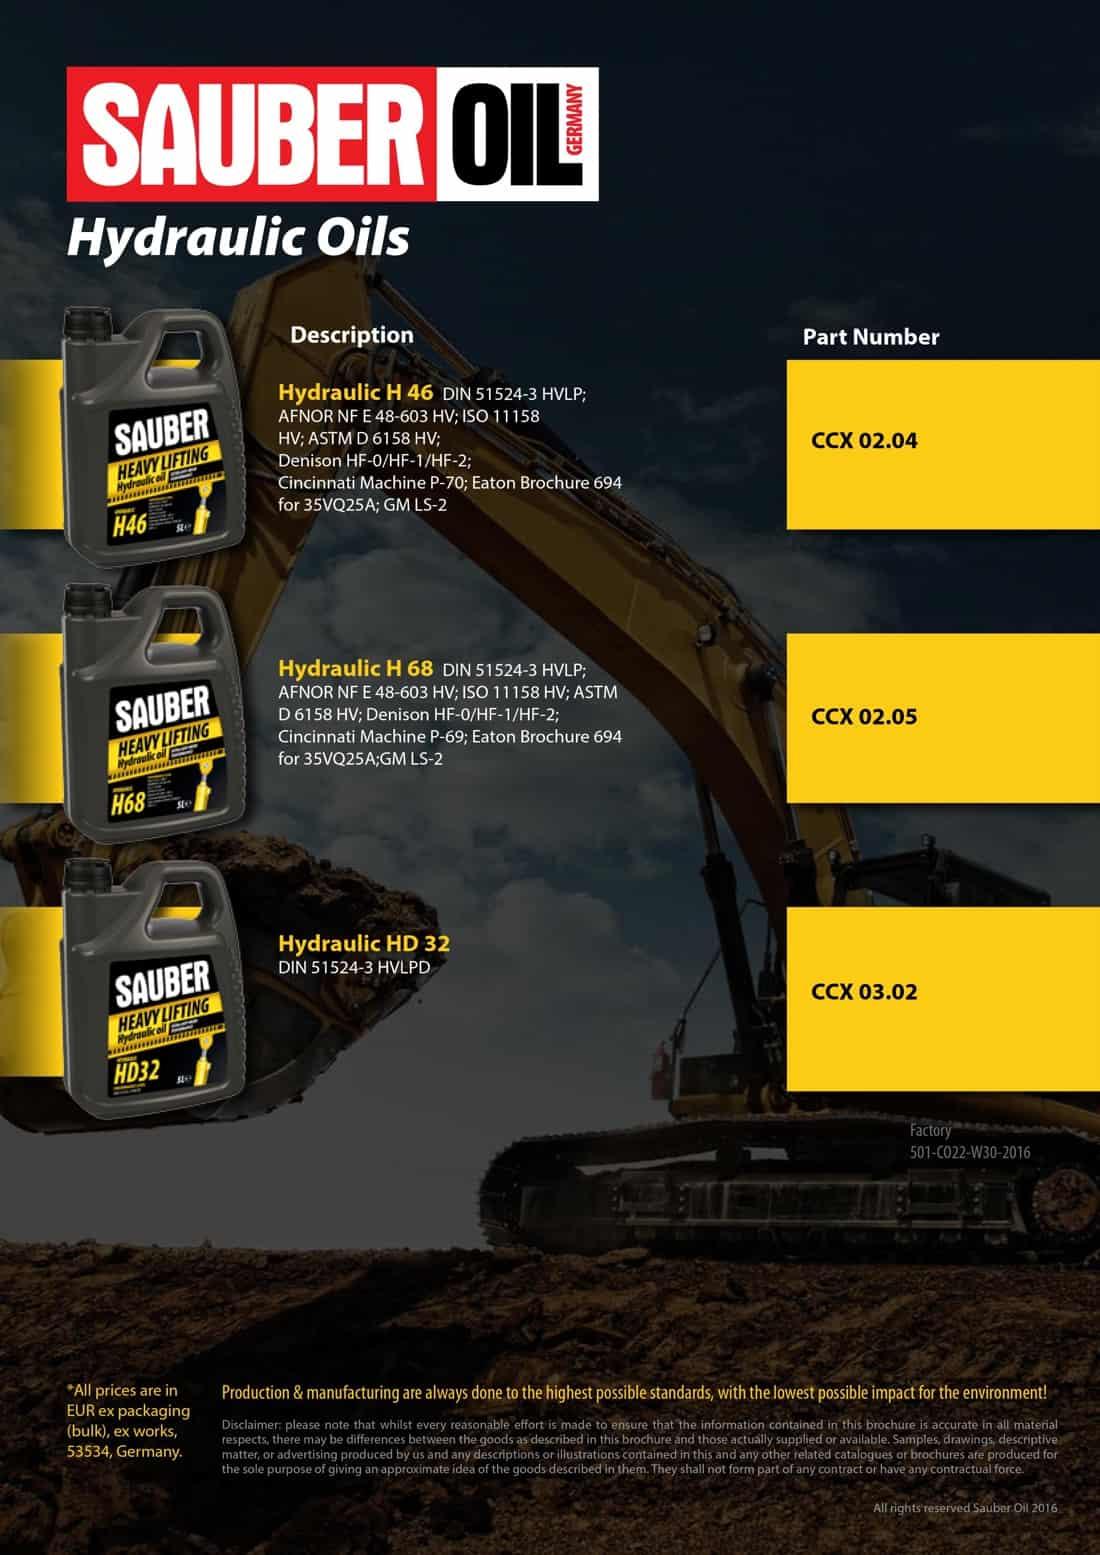 sauber-oil-hydraulics-02